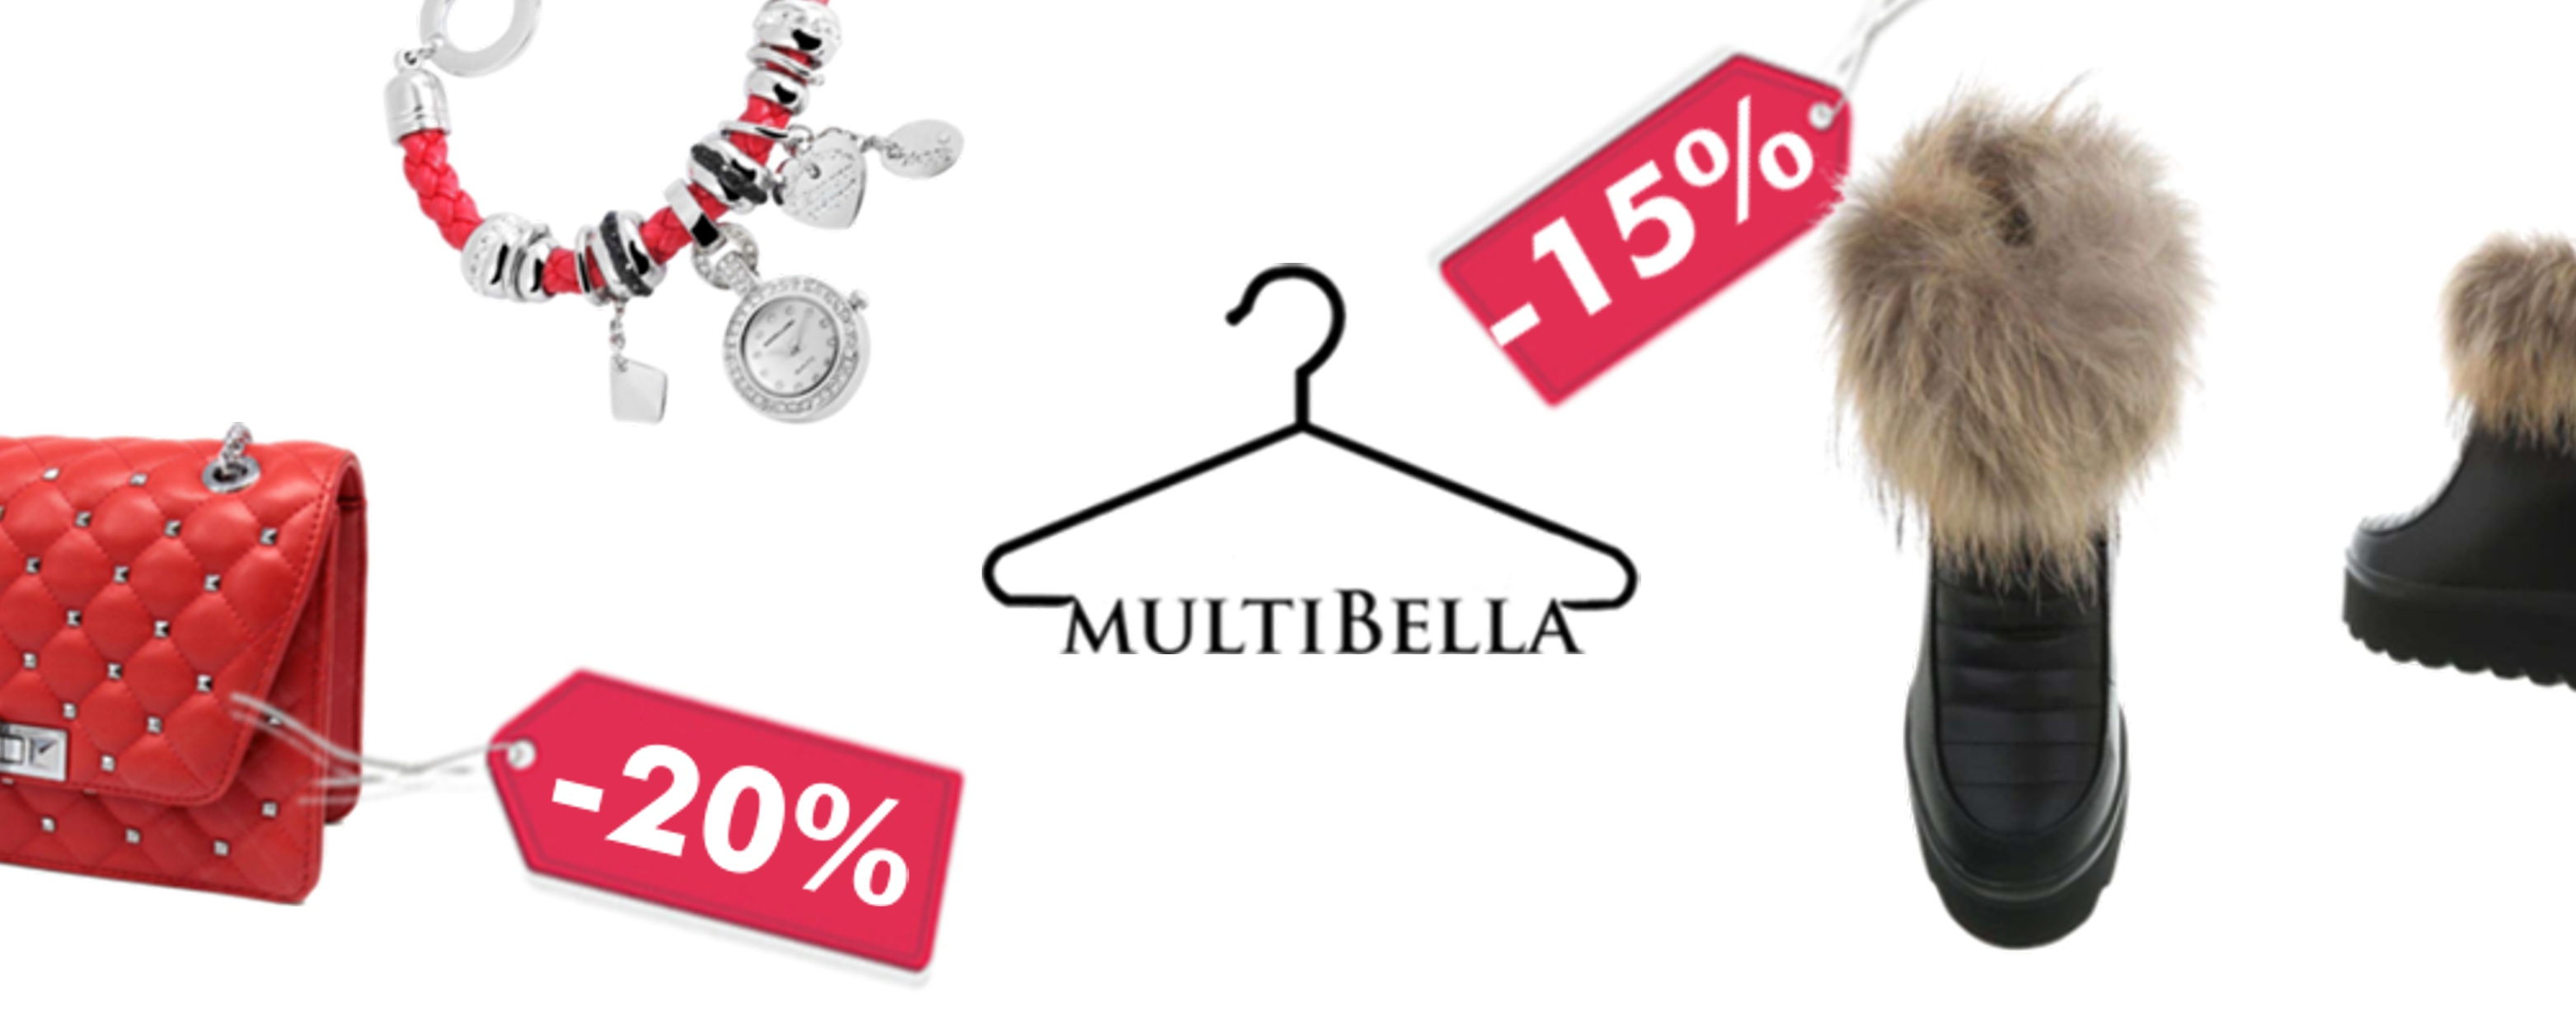 Multibella